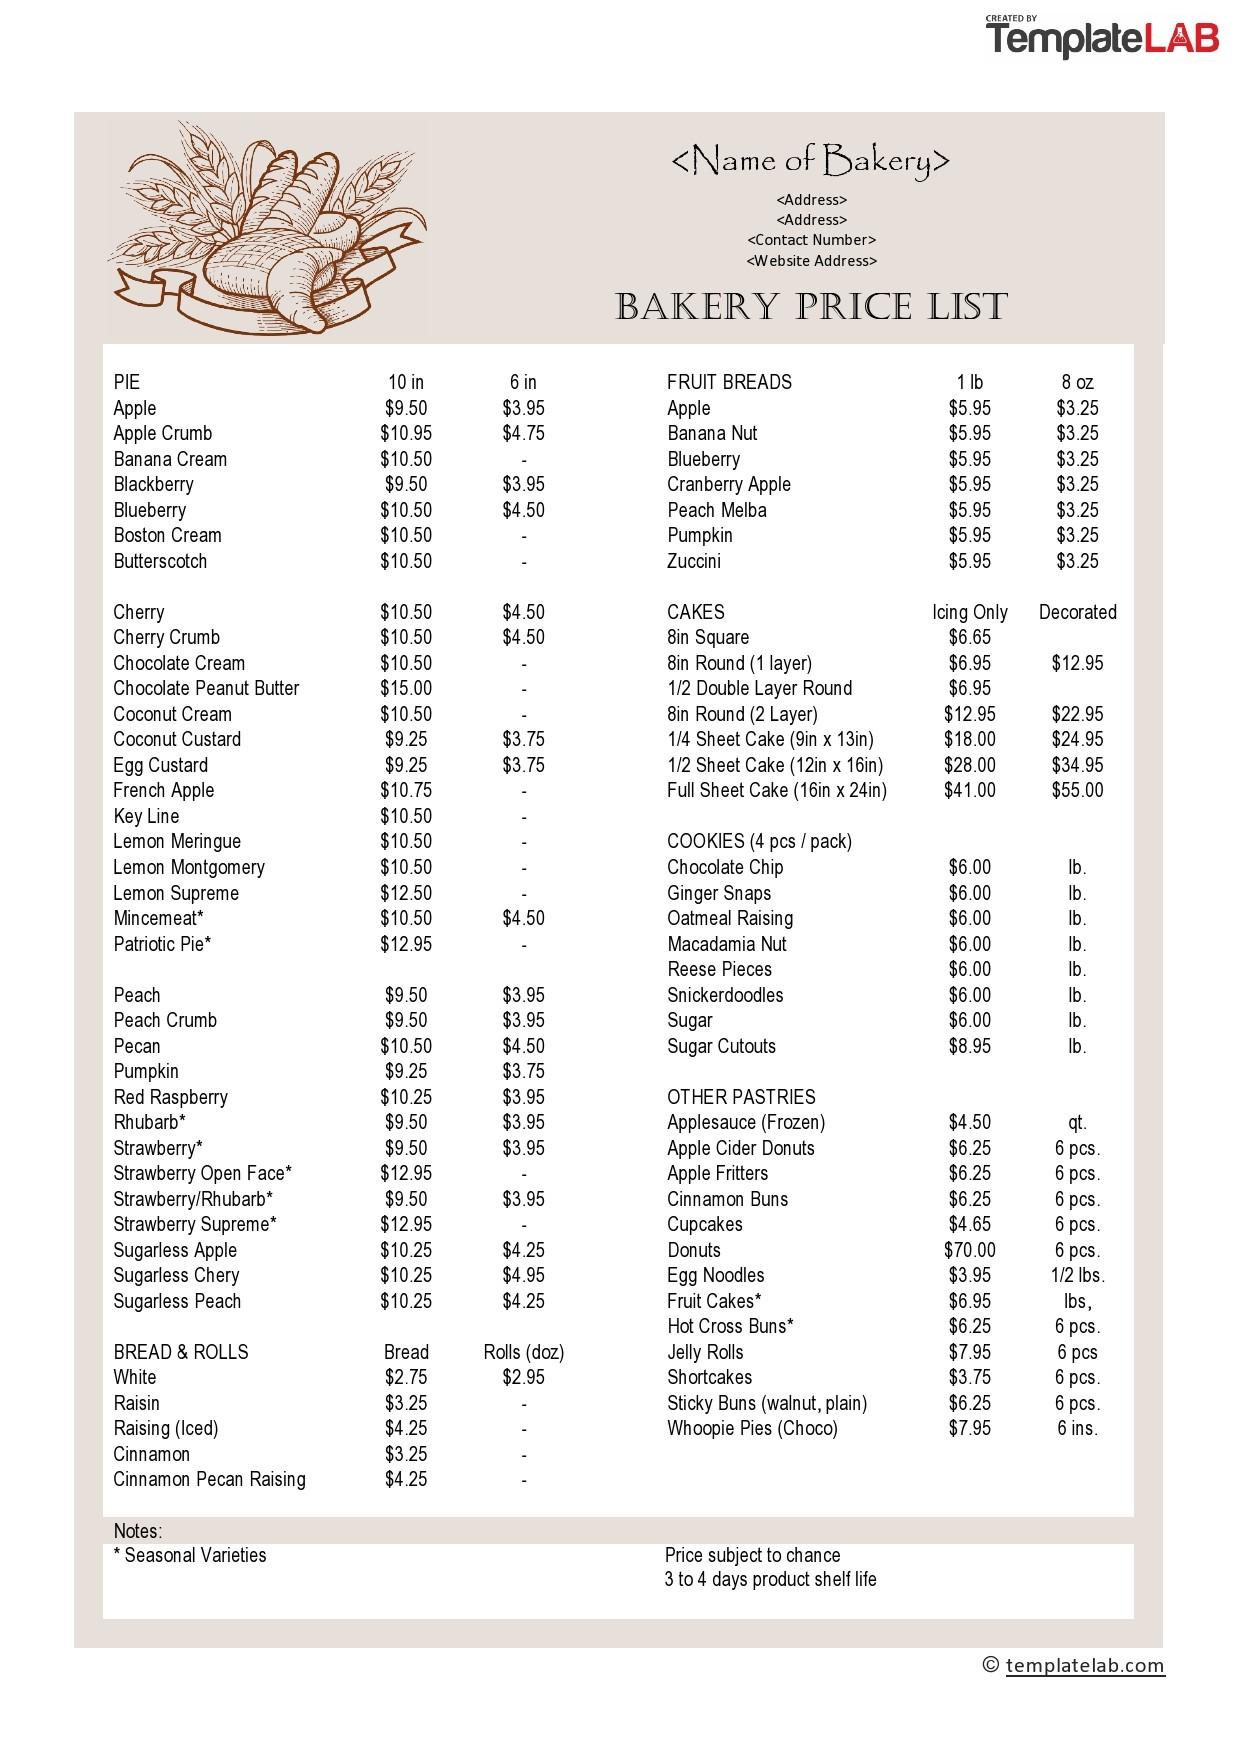 Free Bakery Price List Template - TemplateLab